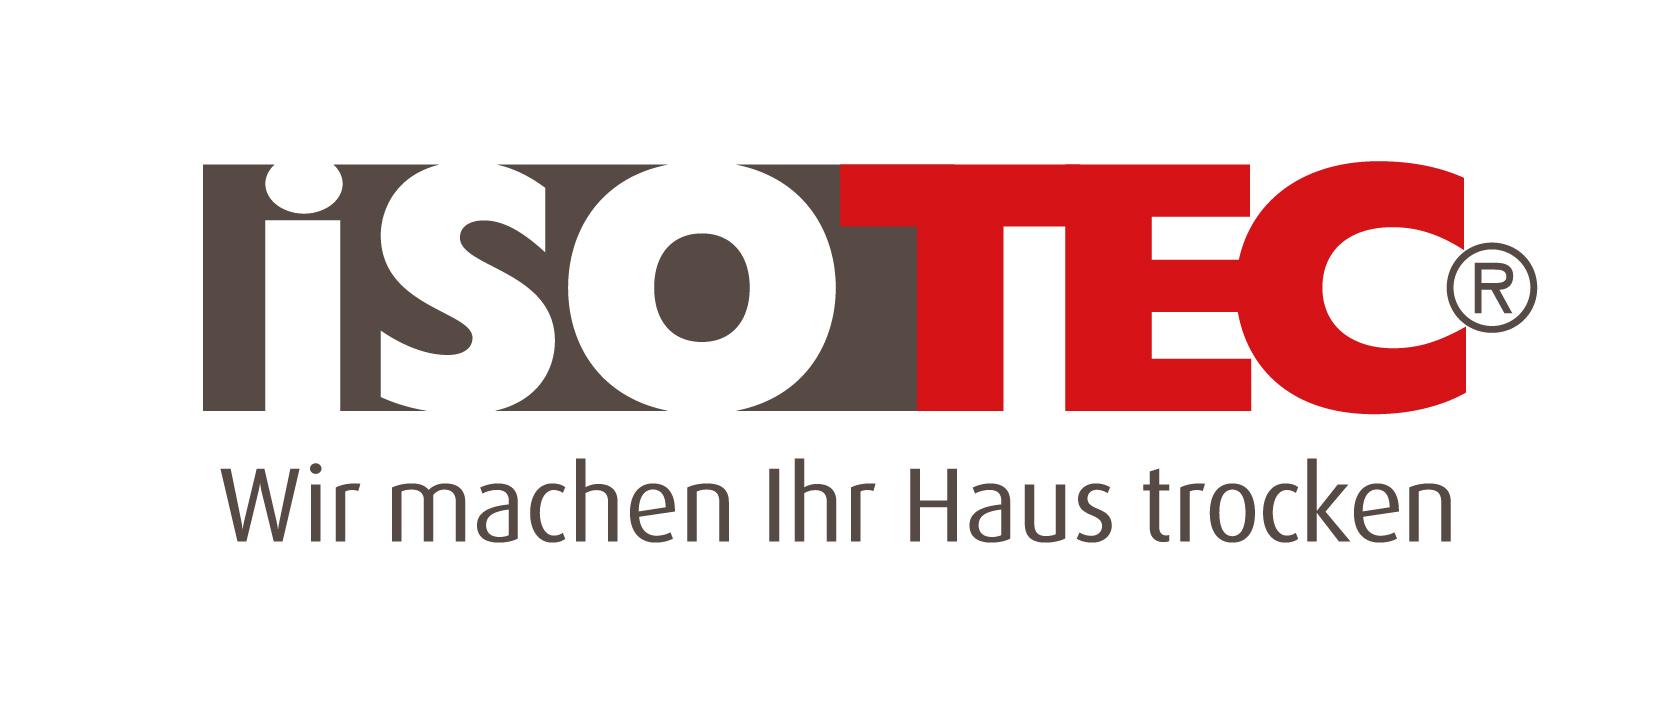 ISOTEC-Fachbetrieb Abdichtungstechnik Rüger GmbH Logo